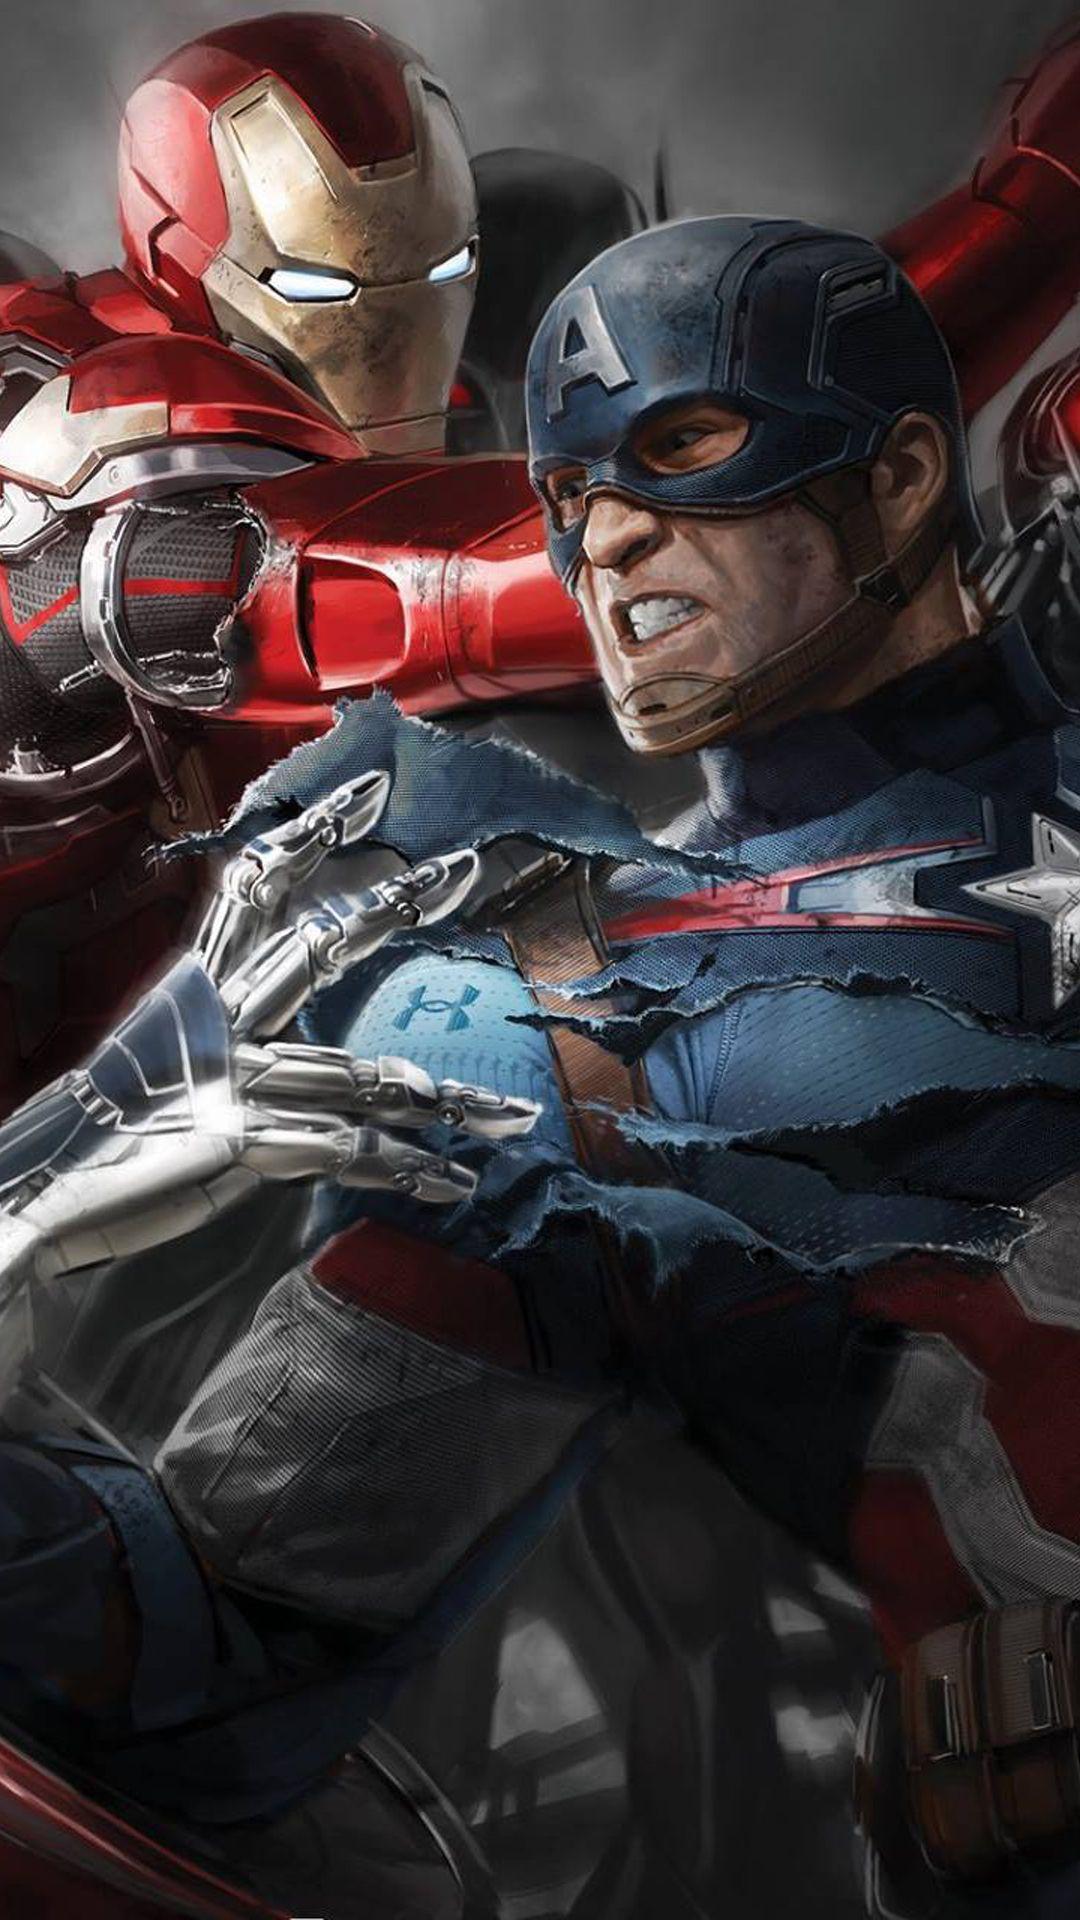 image for captain america civil war wallpaper widescreen xlims